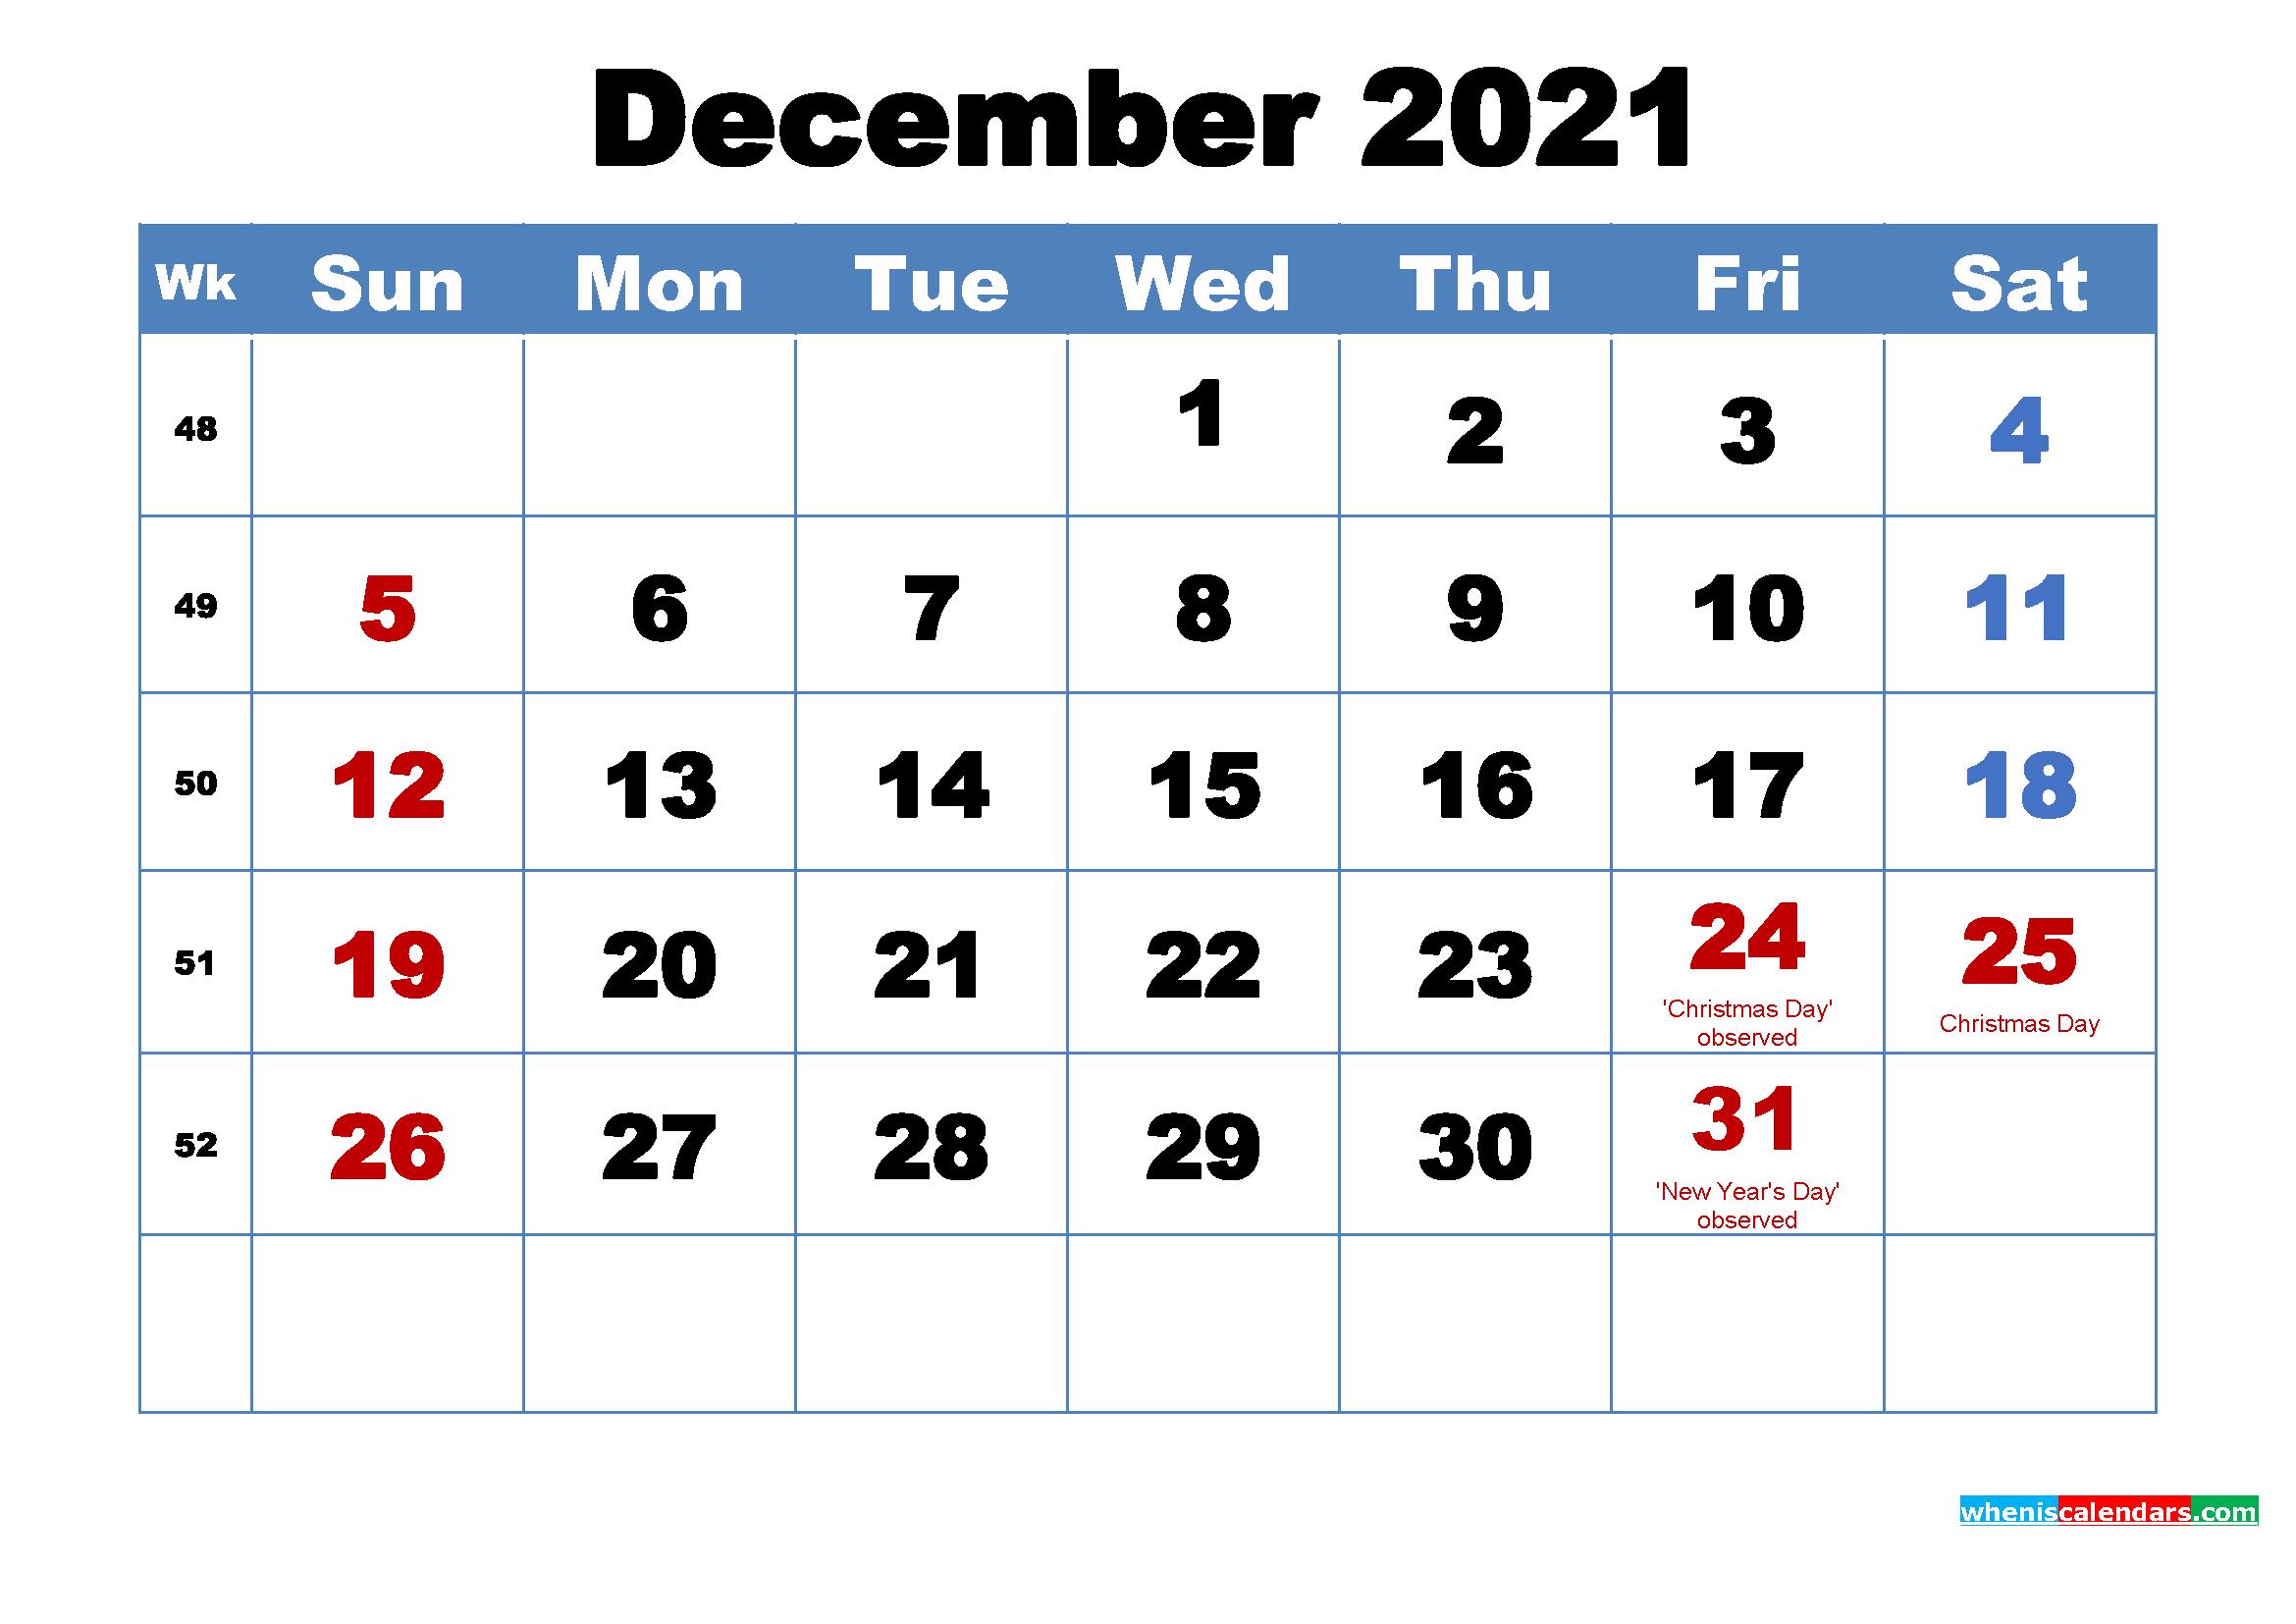 December 2021 Calendar Wallpaper Free Download